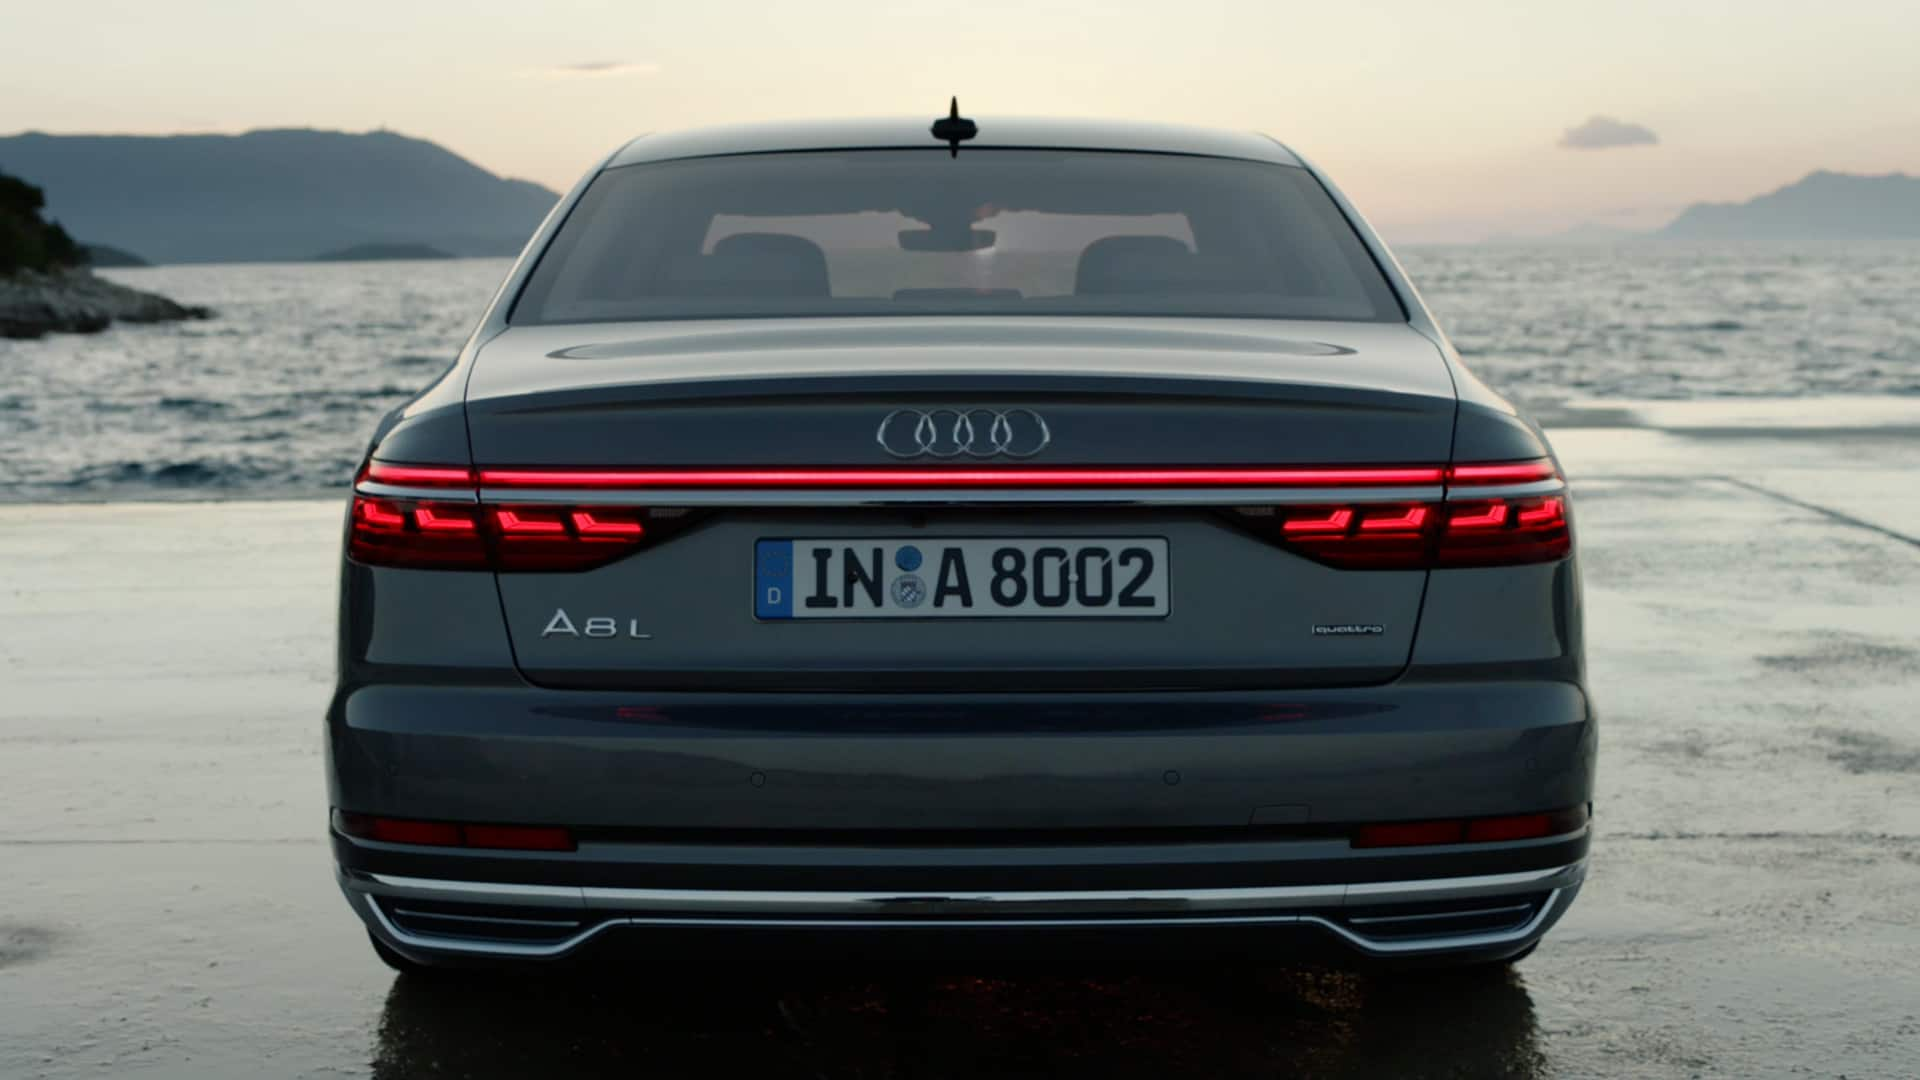 A L A Audi Hong Kong - Audi 8